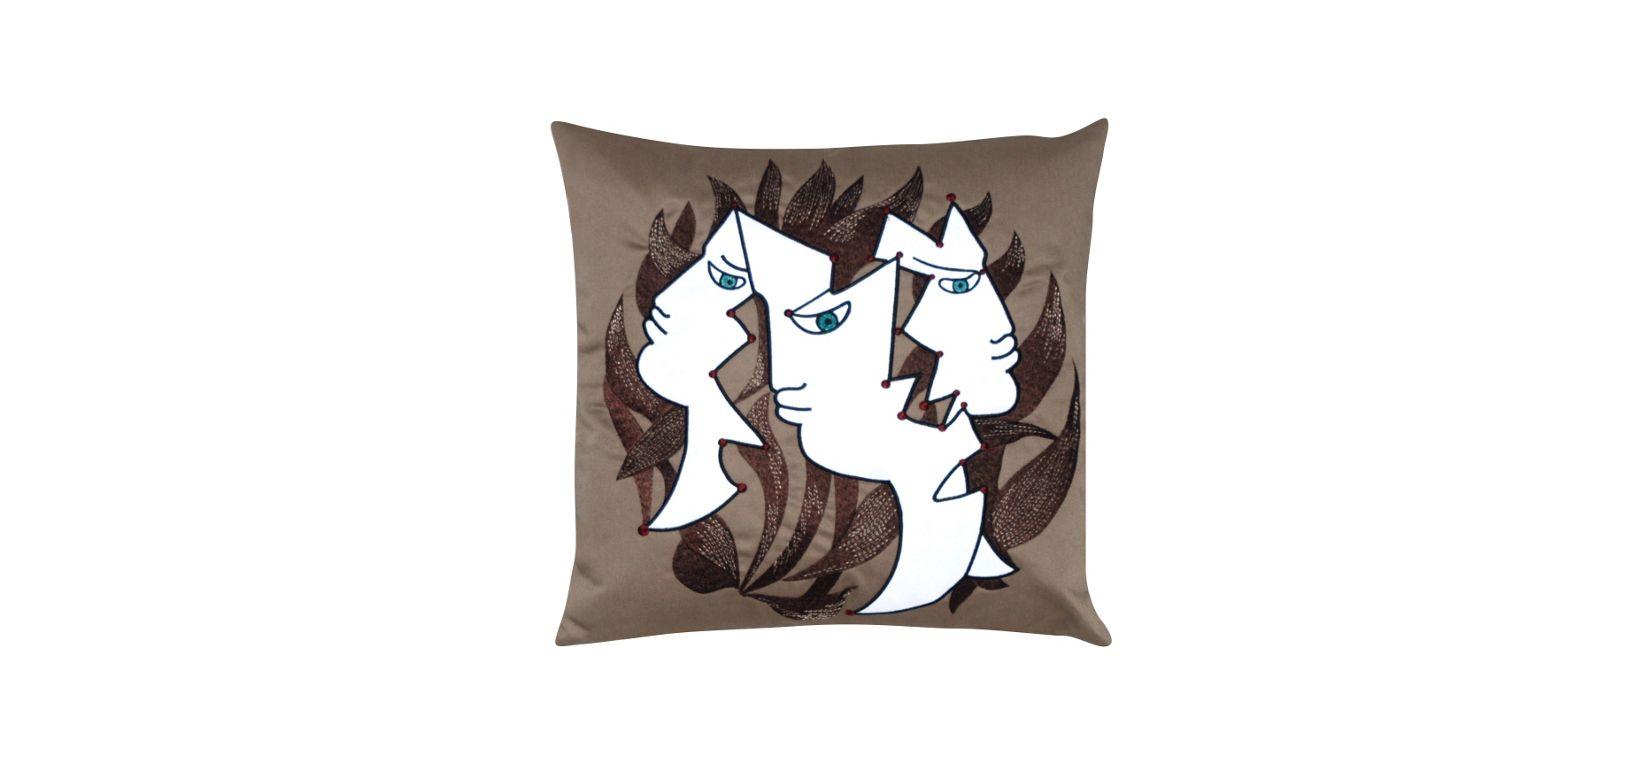 3 visages jean cocteau cuscino roche bobois. Black Bedroom Furniture Sets. Home Design Ideas